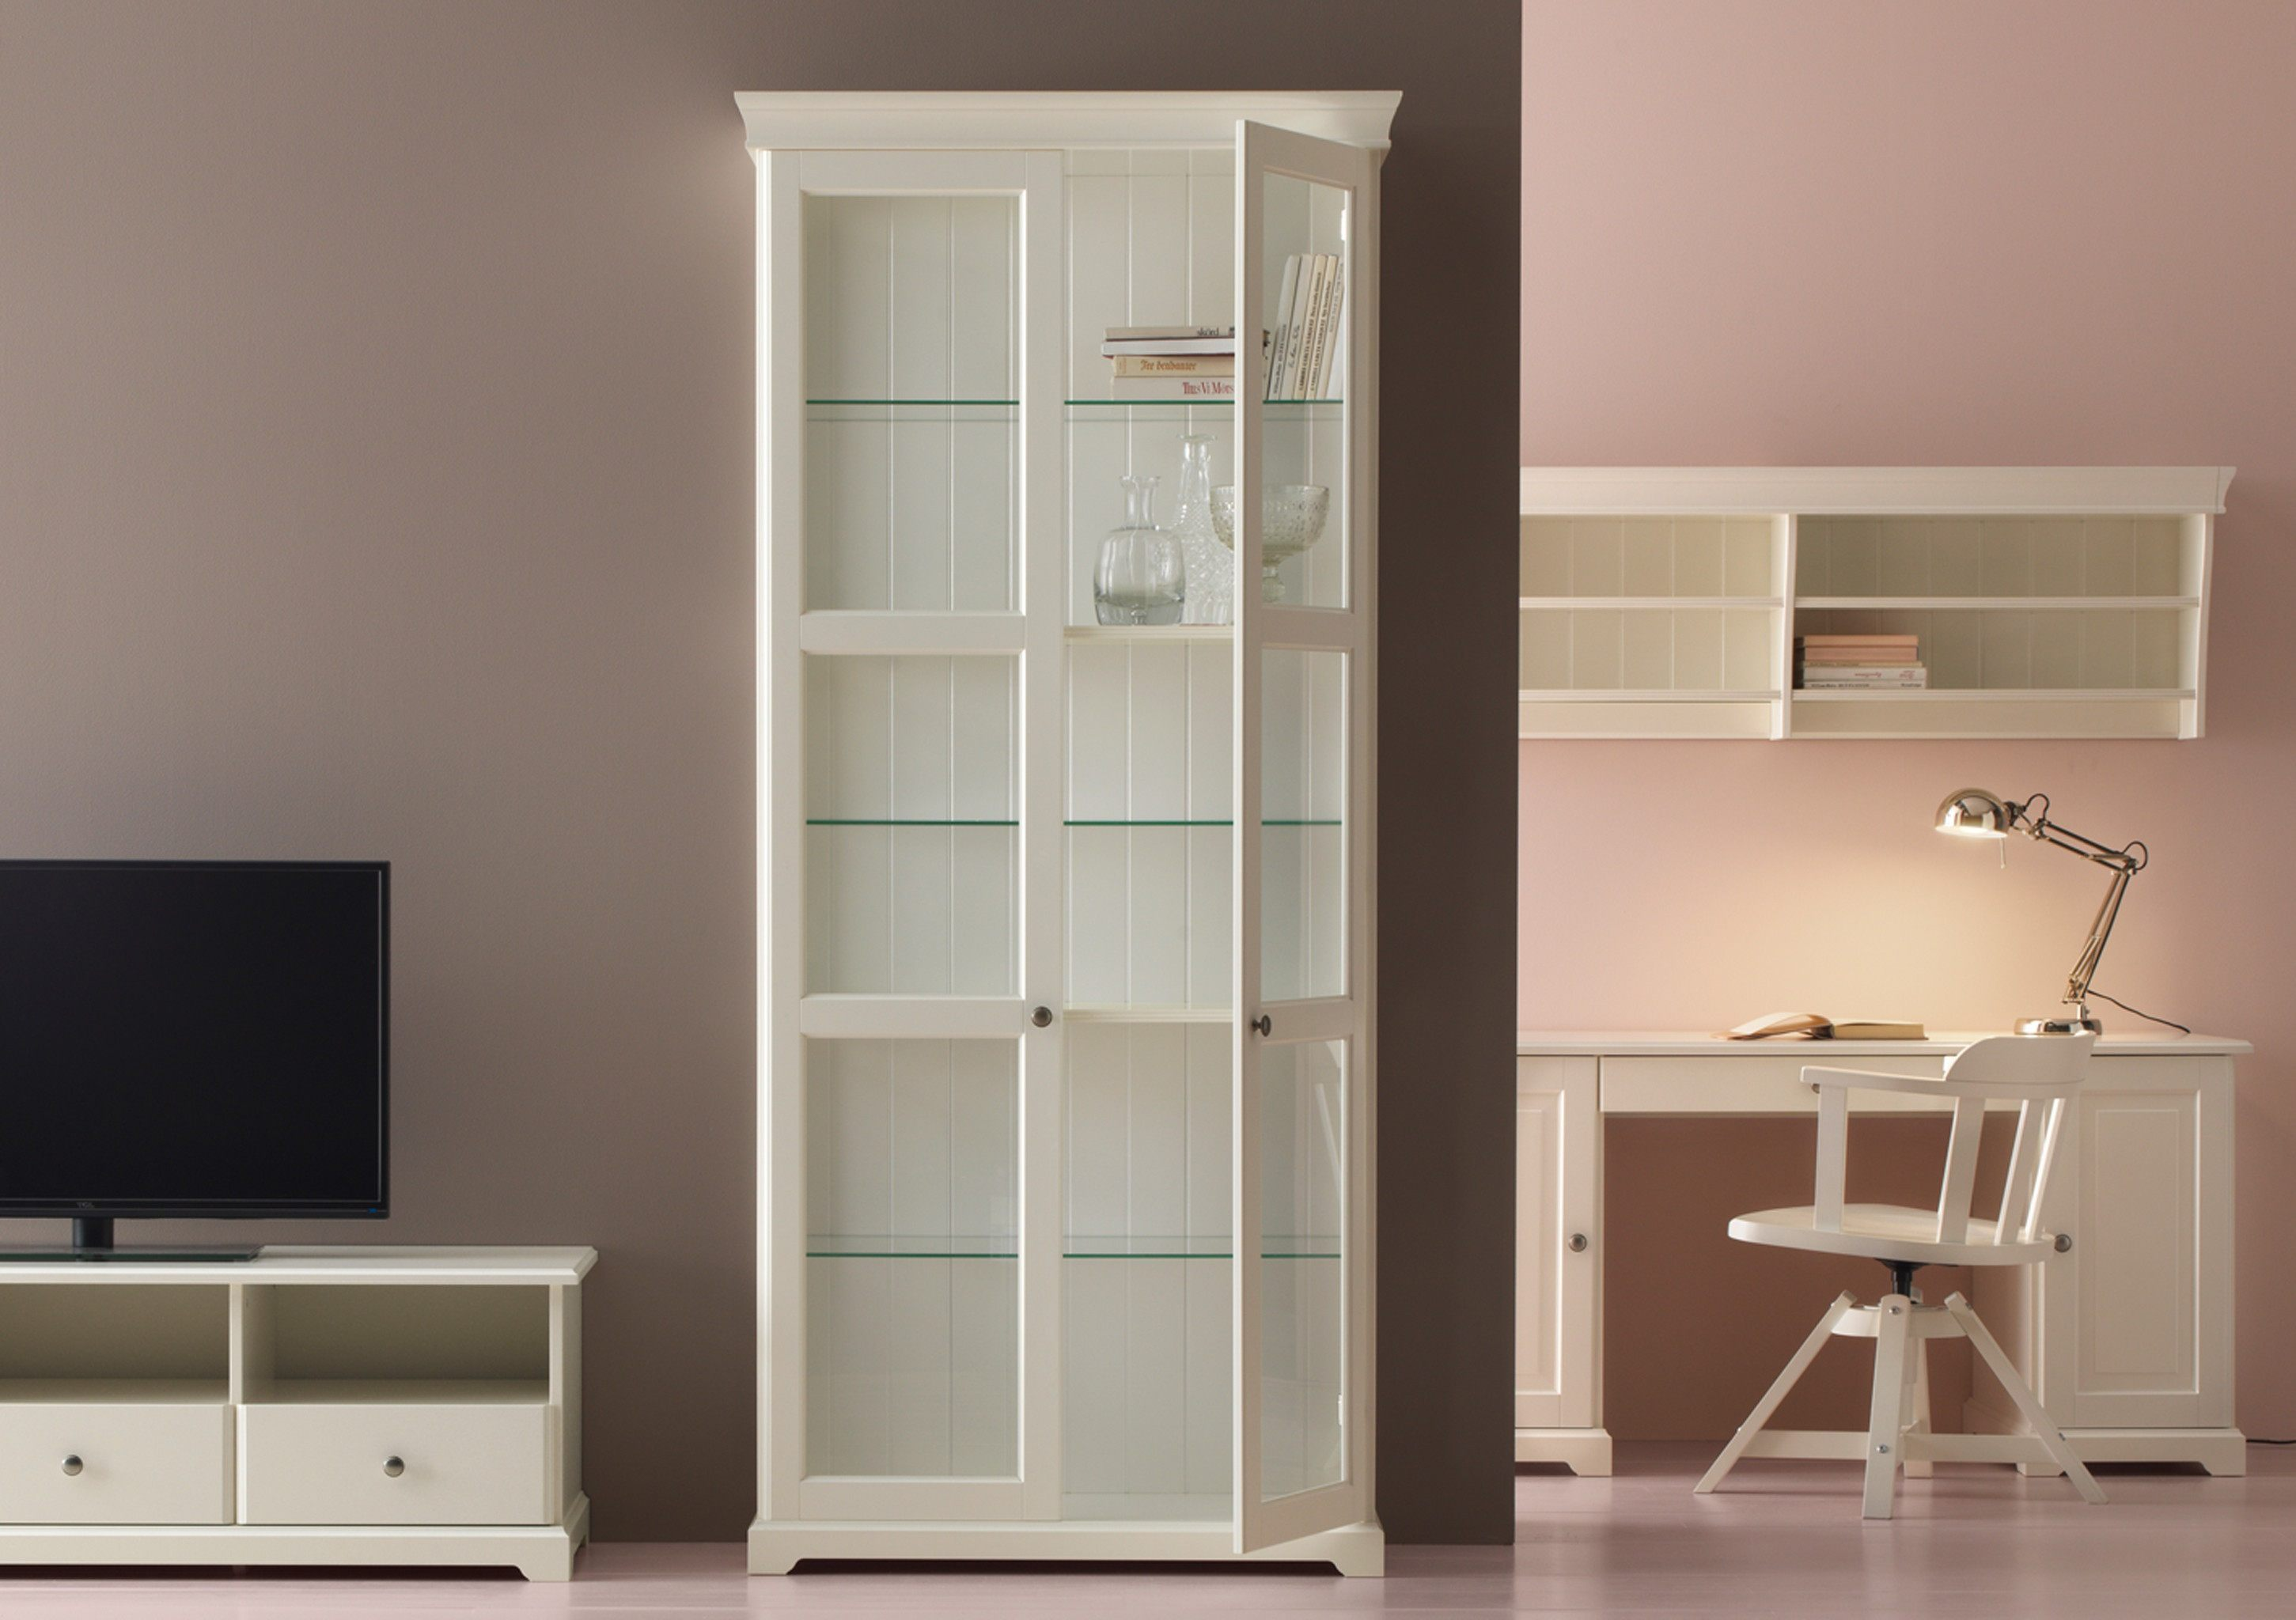 Lit biné Mezzanine Bureau Armoire élégant Bureau Fer forgé Ikea